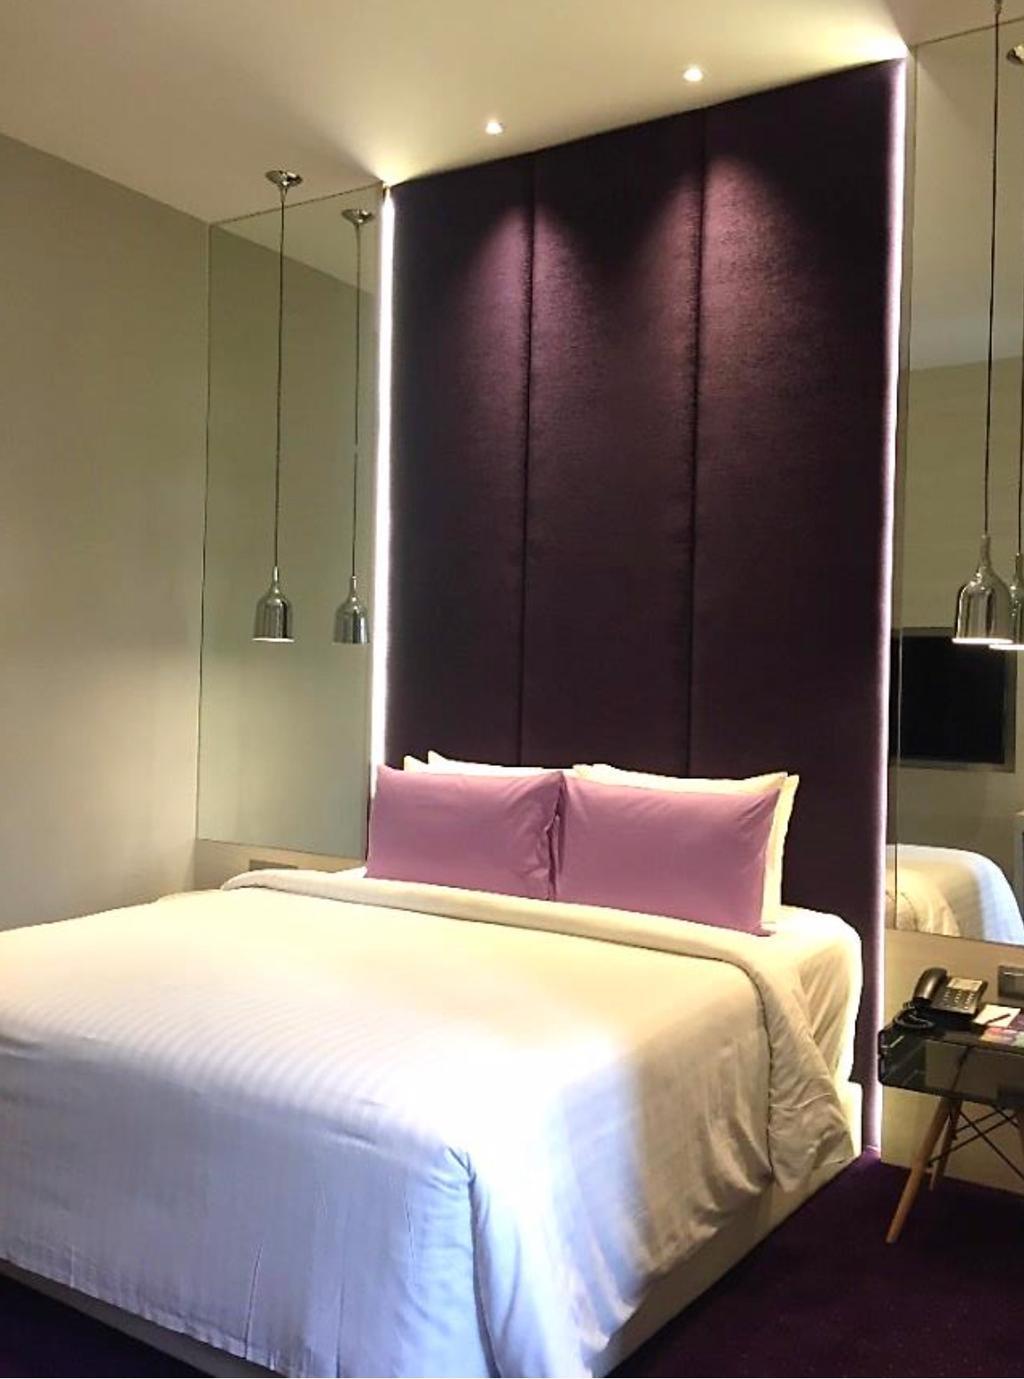 Pullman Hotel, Putrajaya, Commercial, Interior Designer, Goodwinds Interior Design Sdn. Bhd., Modern